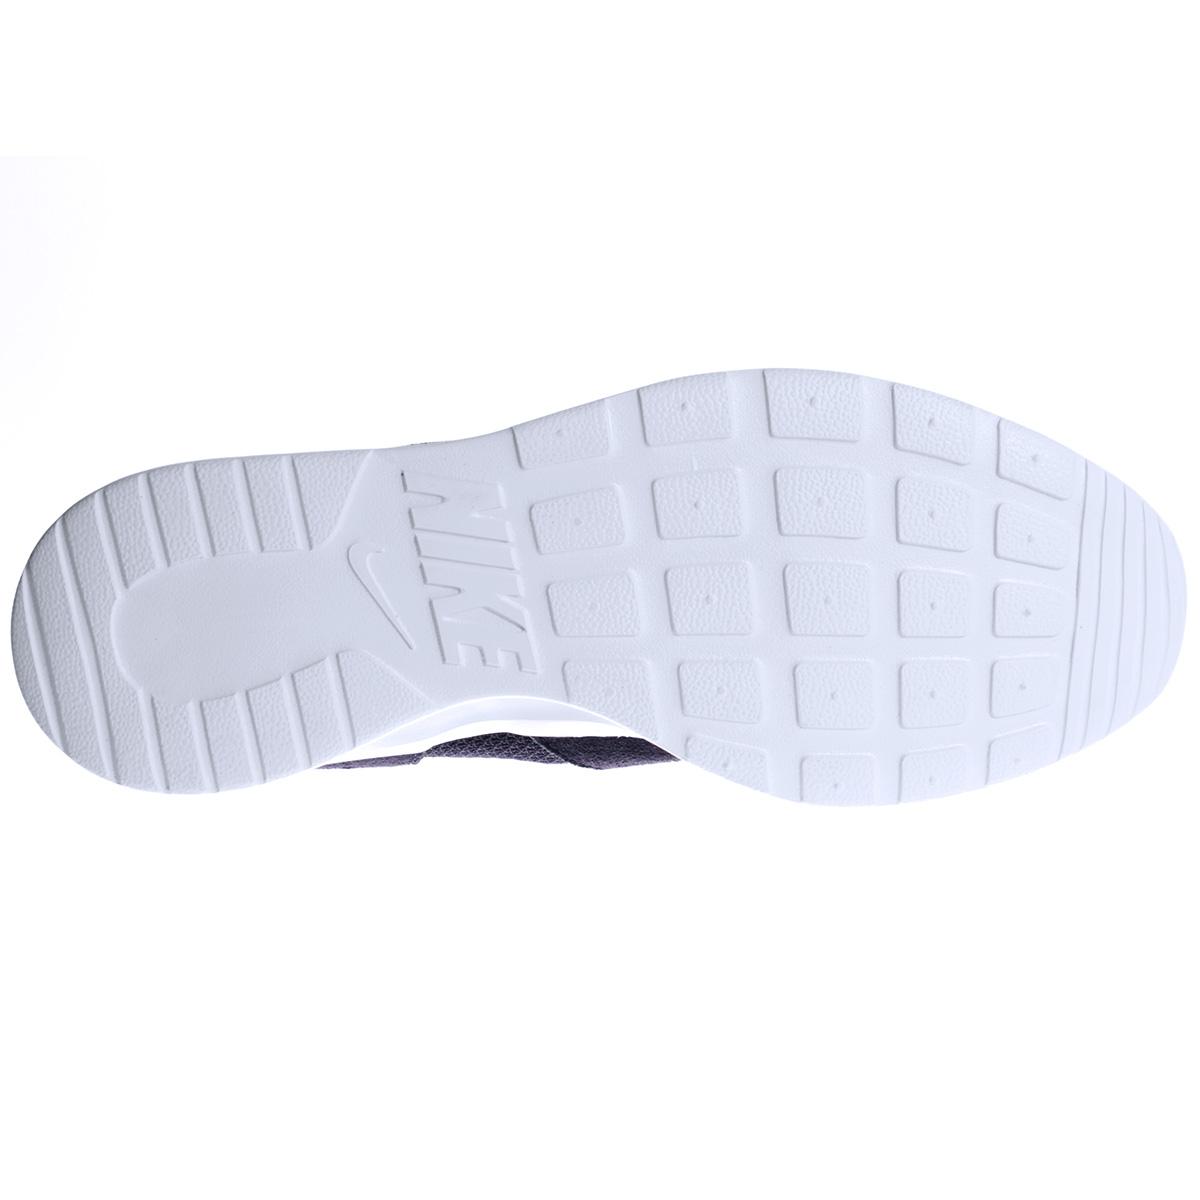 Woedcrxb Pxoiktzu Suelas Tipos De Tenis Nike shrQdCtxBo